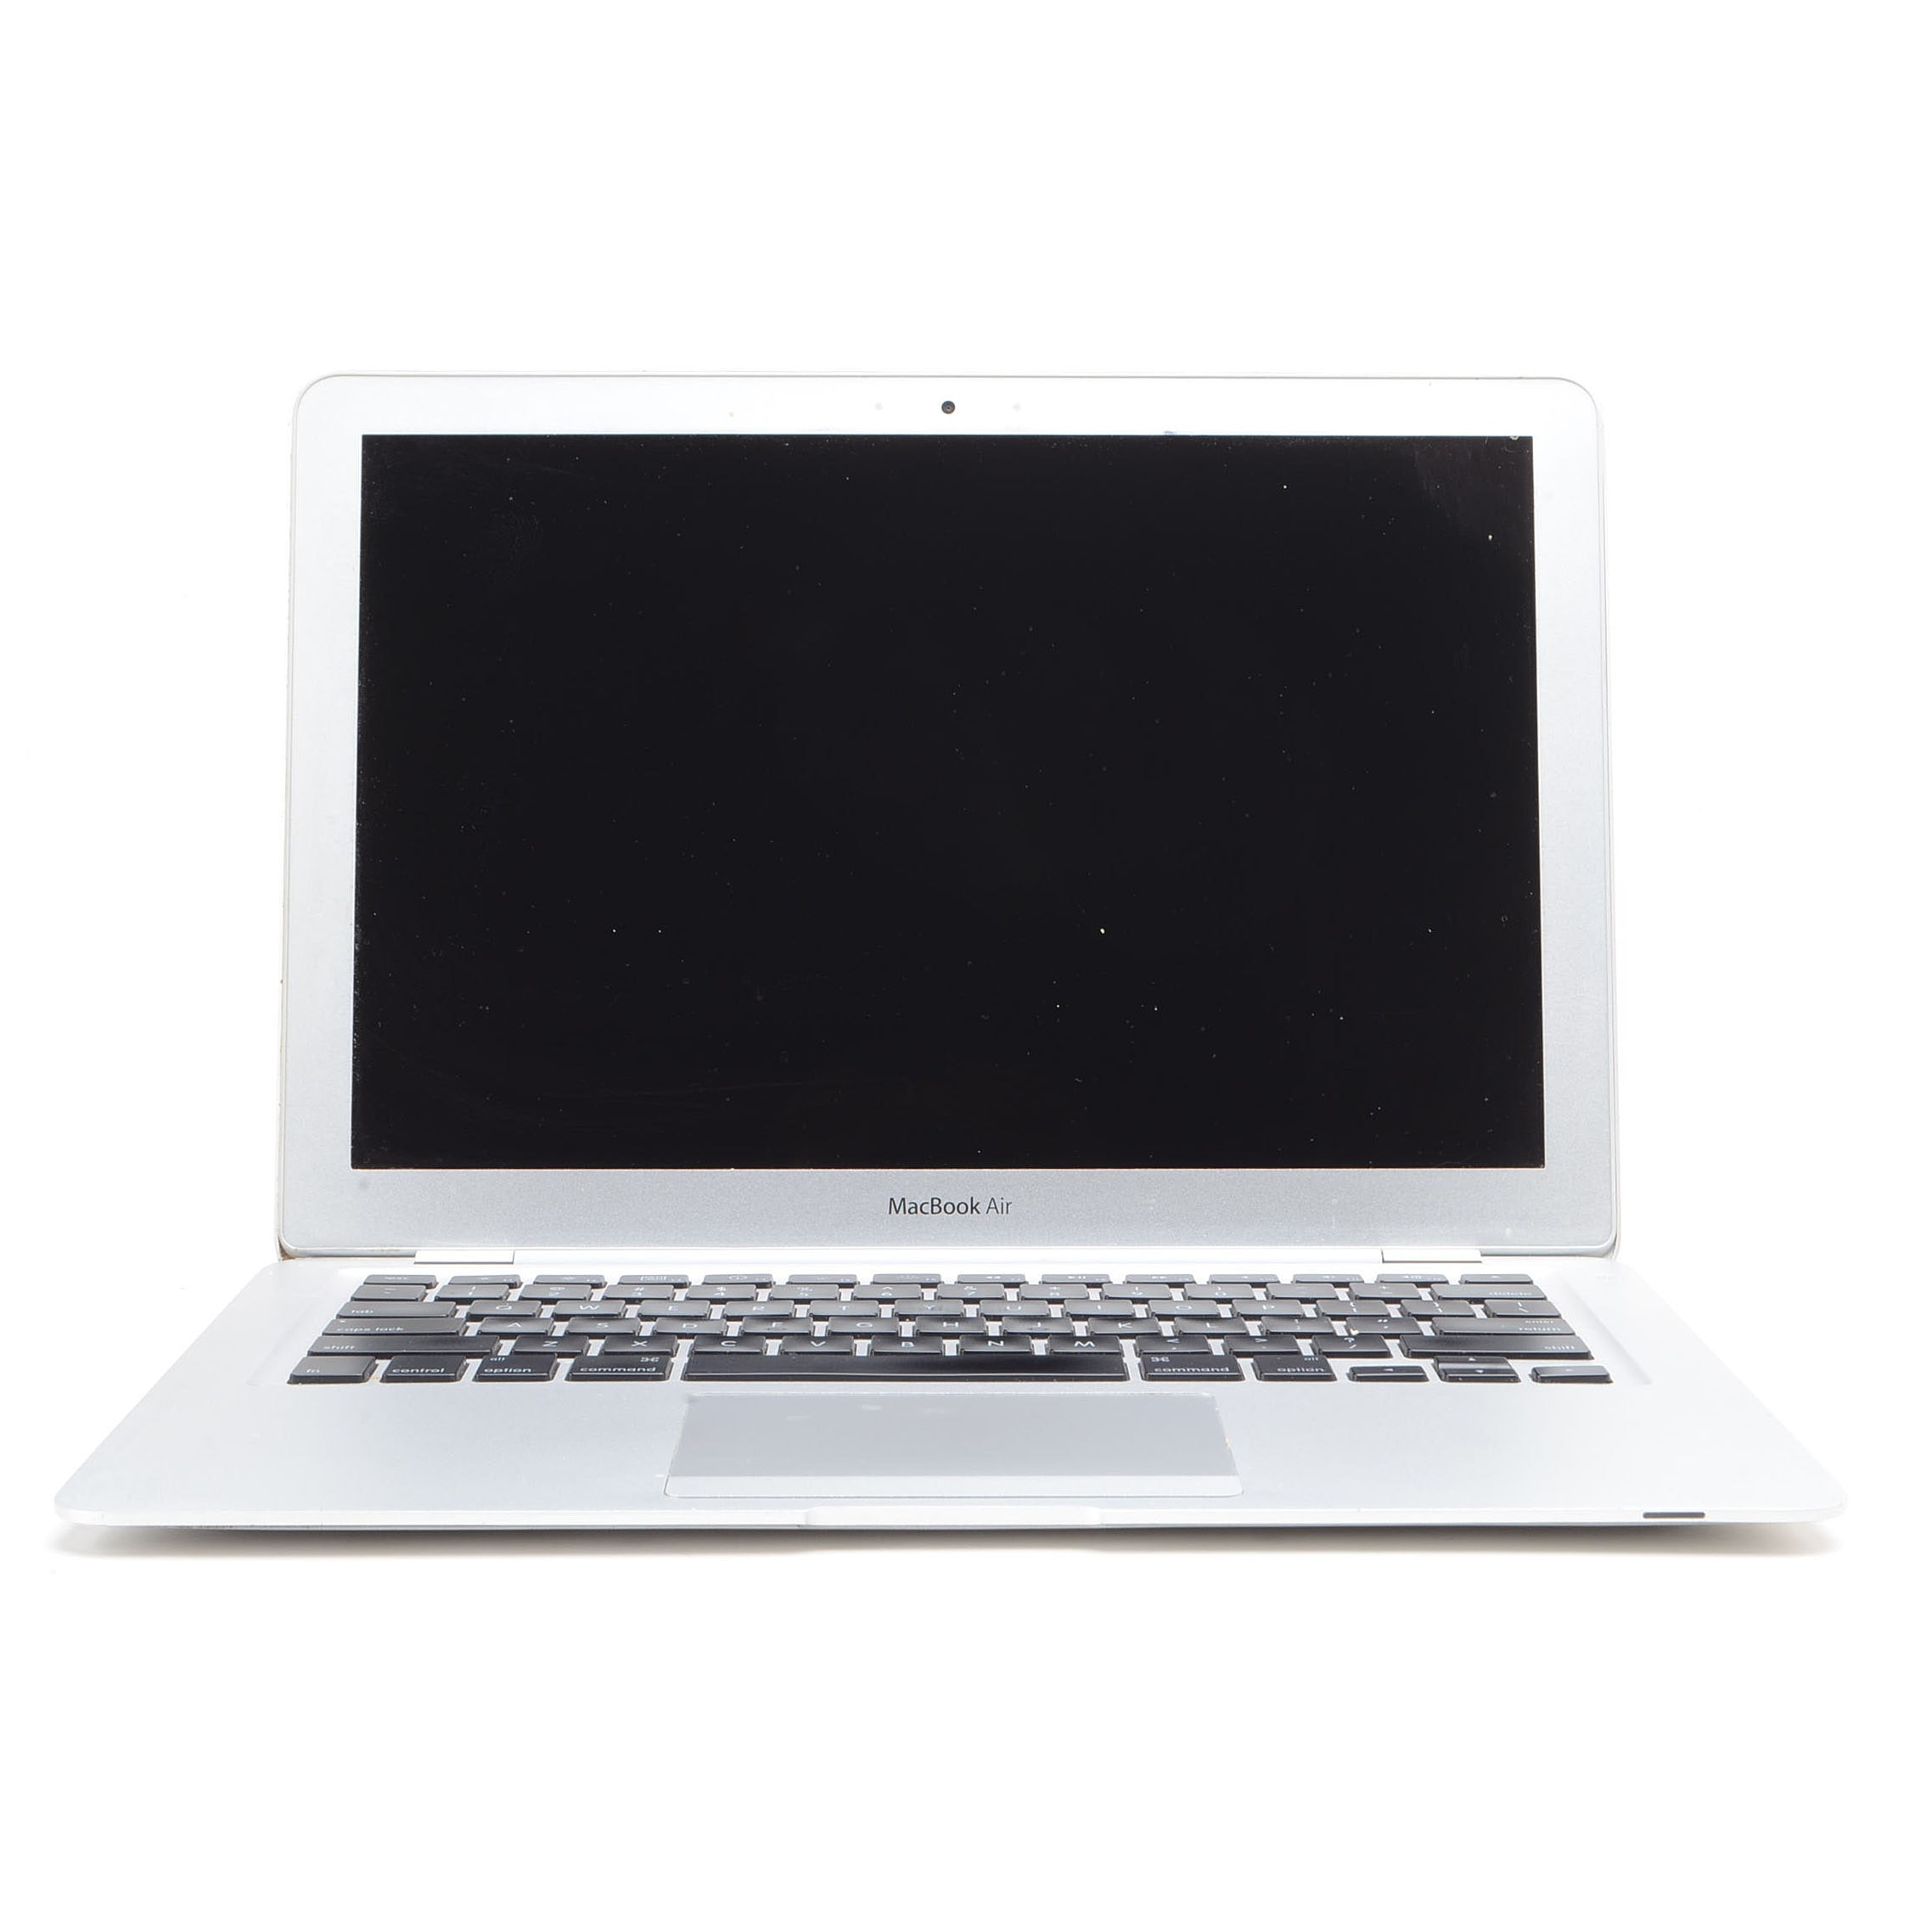 "13"" MacBook Air Laptop"